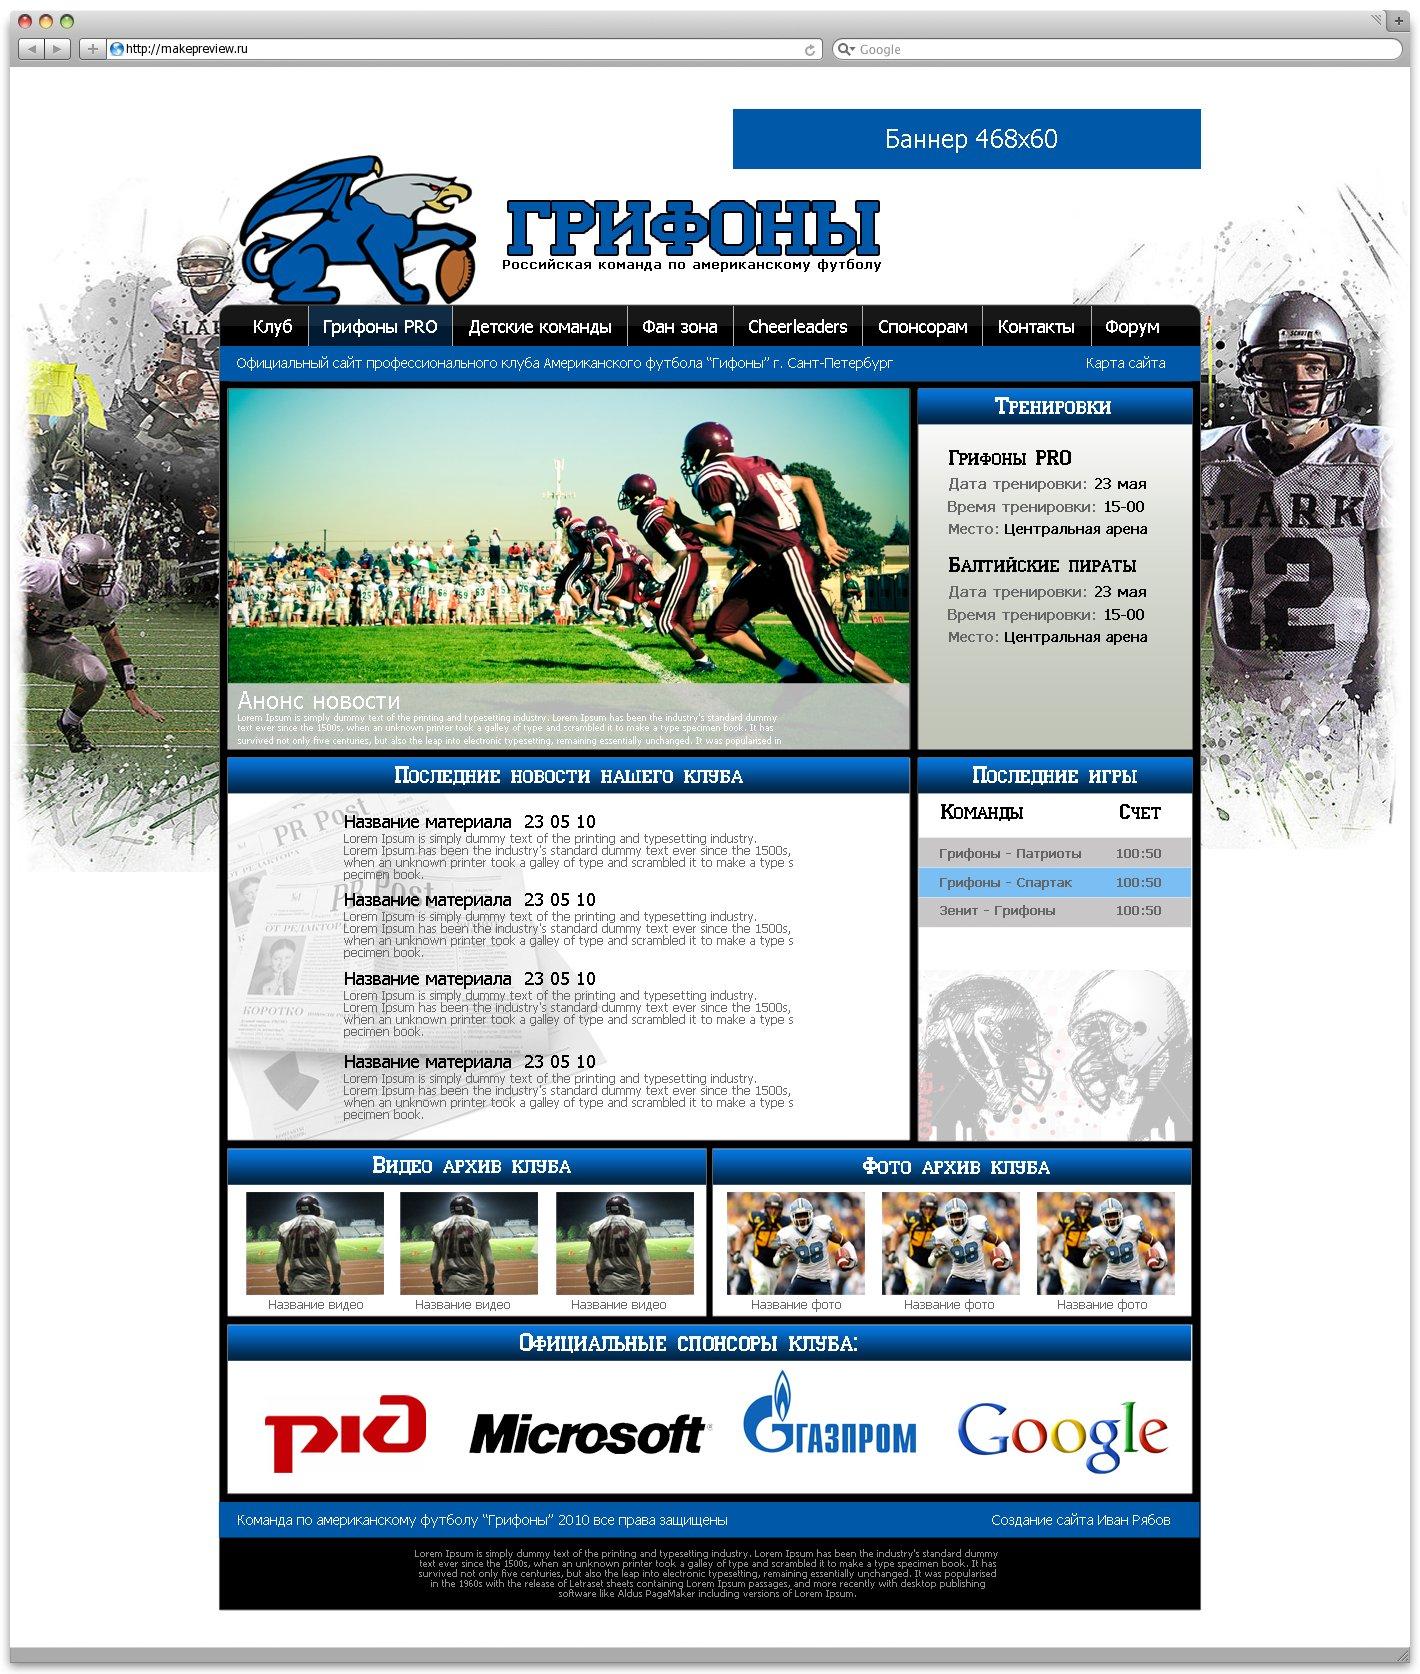 Сайт команды по регби